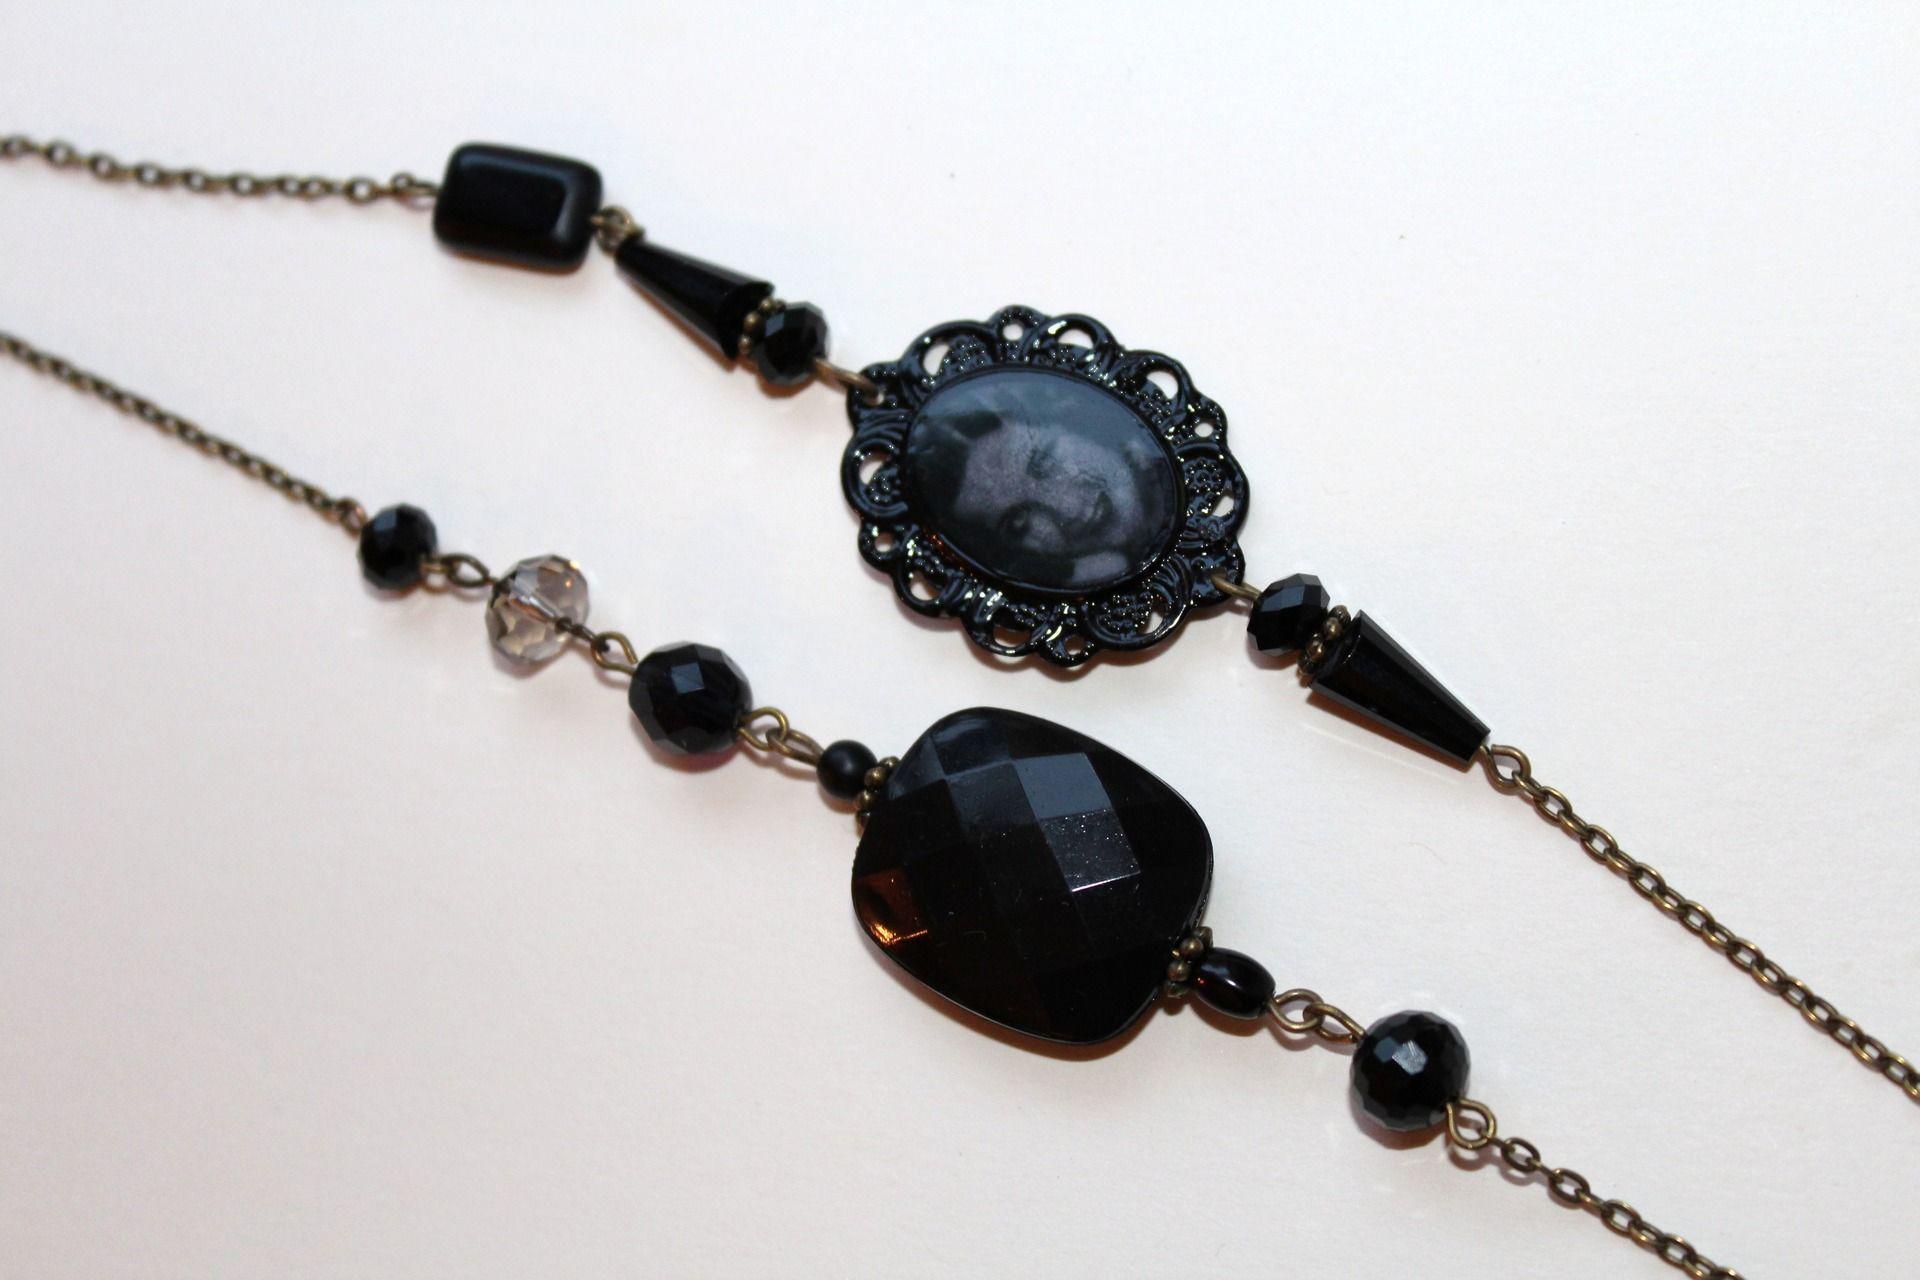 black retro with 30 s style cameo long necklace by accessoires retro de cessi